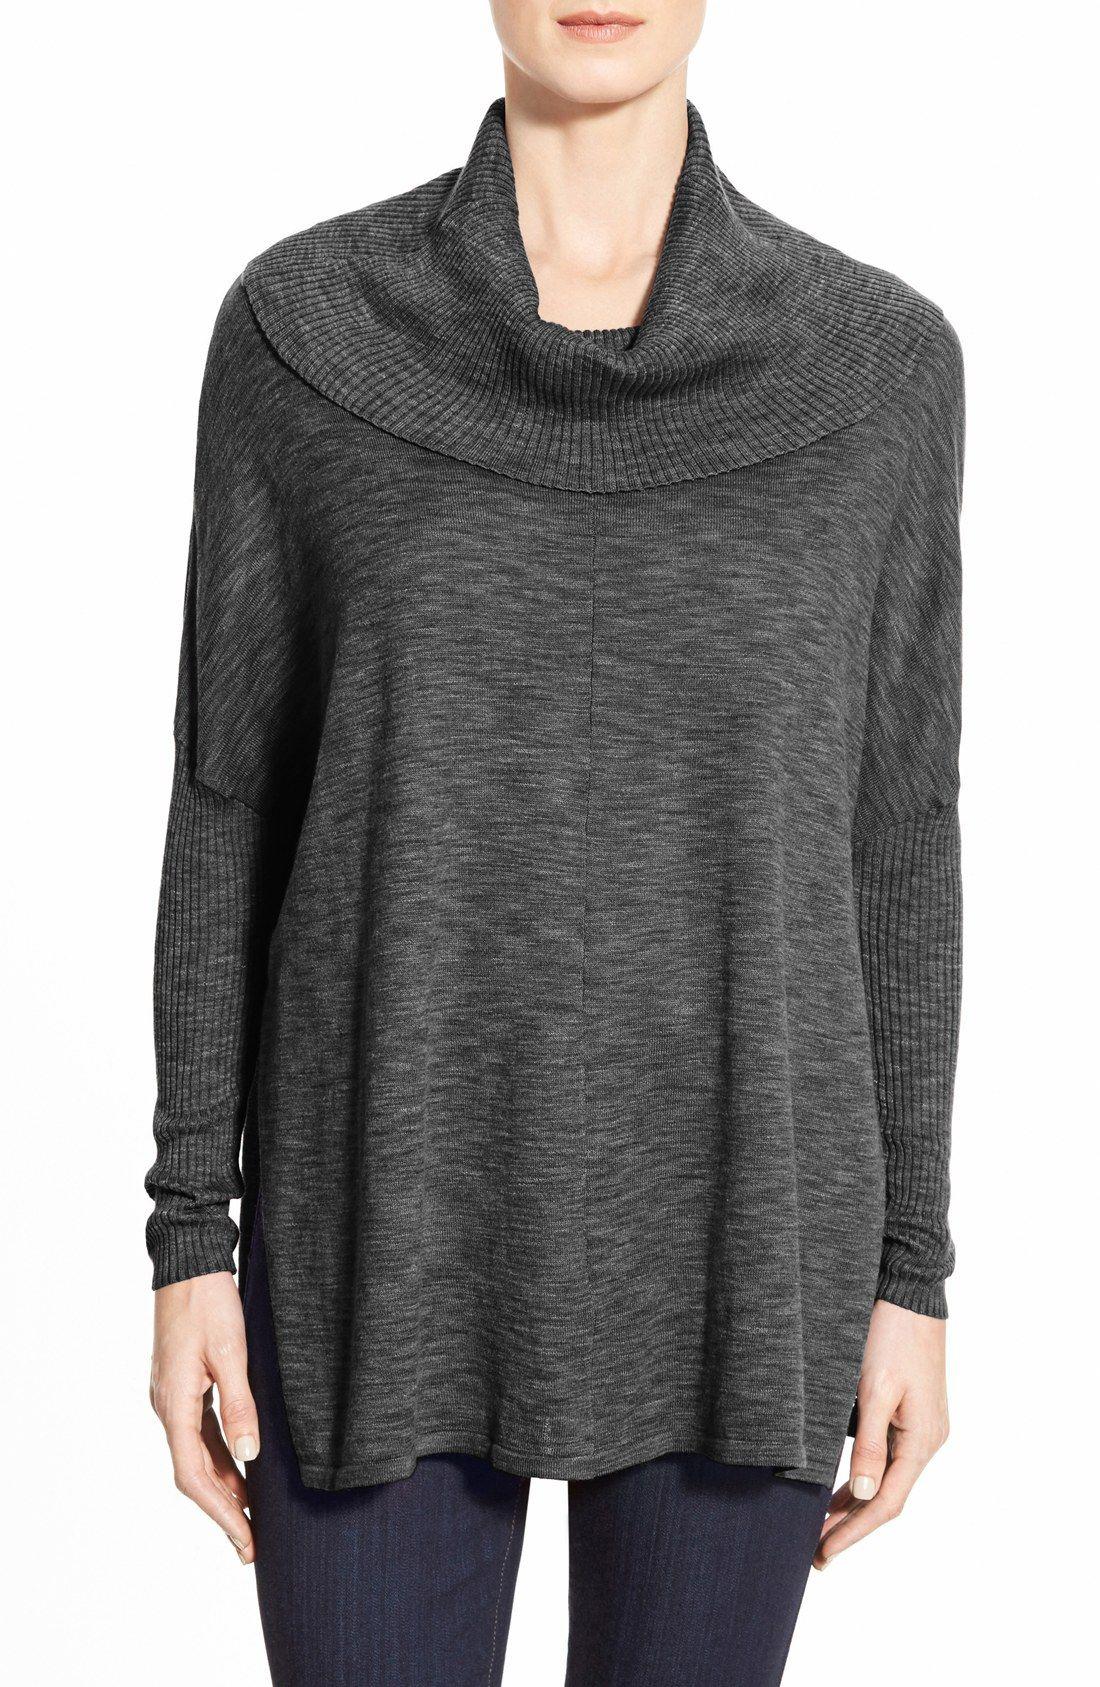 Fever Space Dye Cowl Neck Dolman Sleeve Tunic. Cotton Modal Blend ...